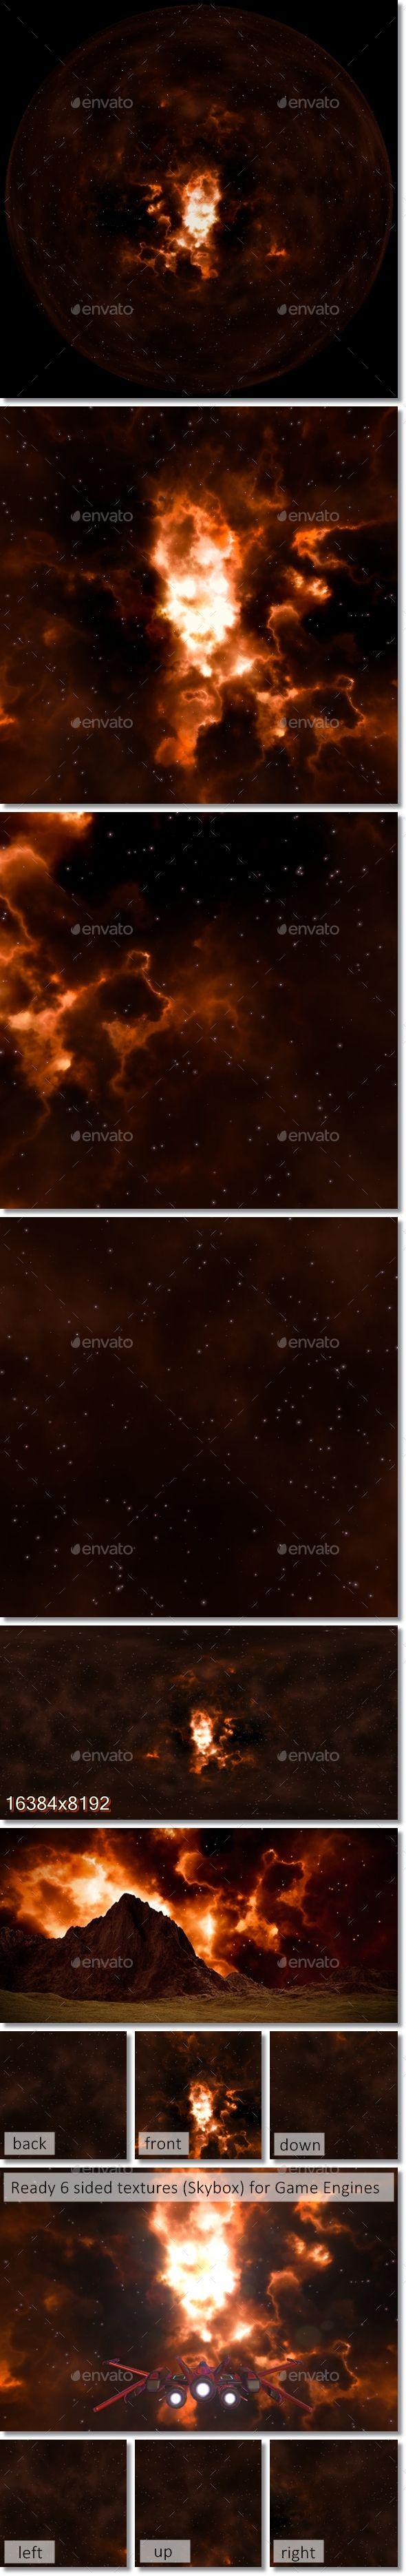 Nebula Space Environment HDRI Map 001 #Environment, #Space, #Nebula